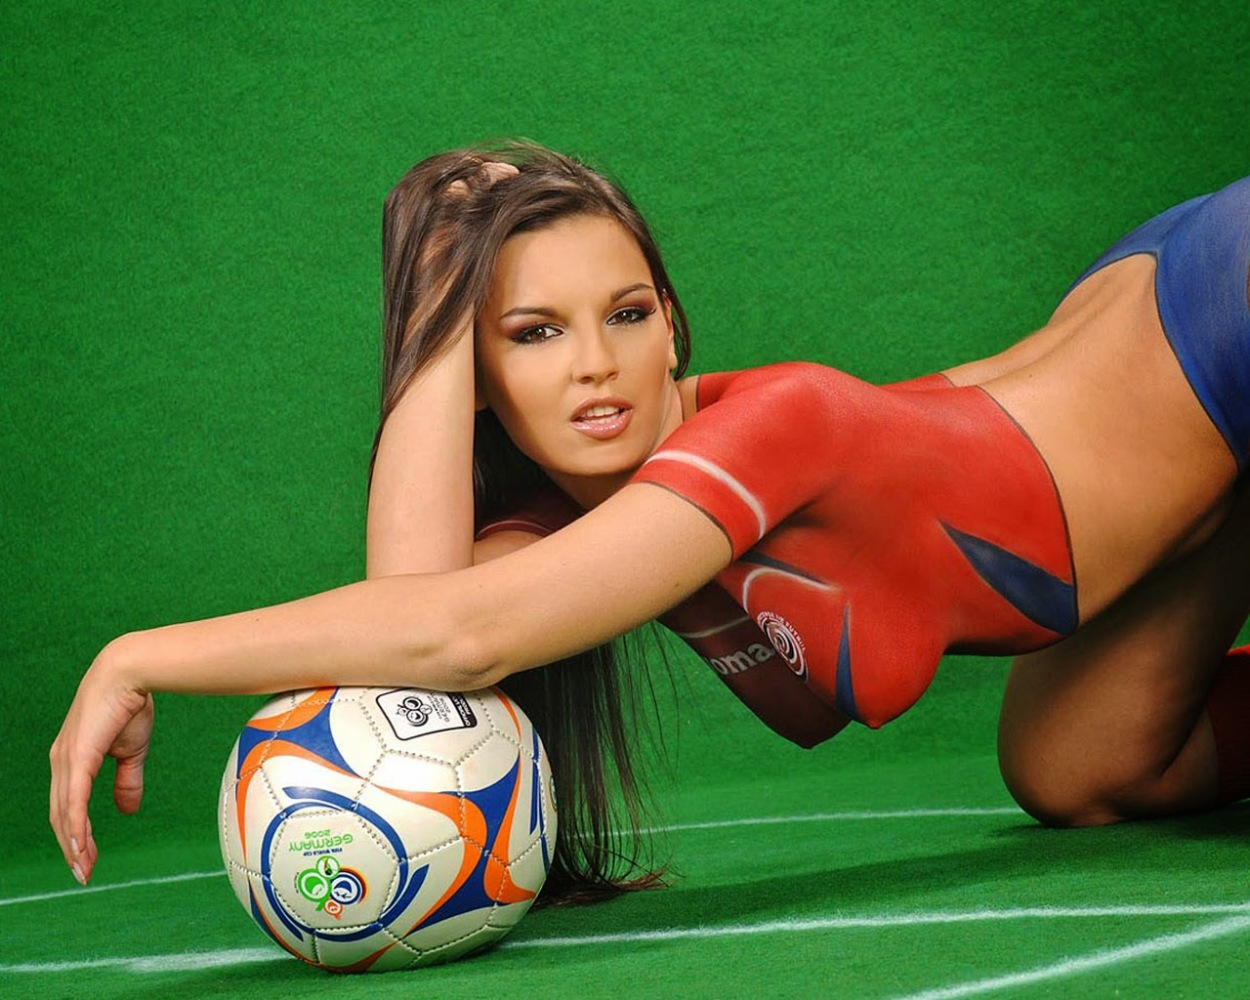 Sexy football crotch